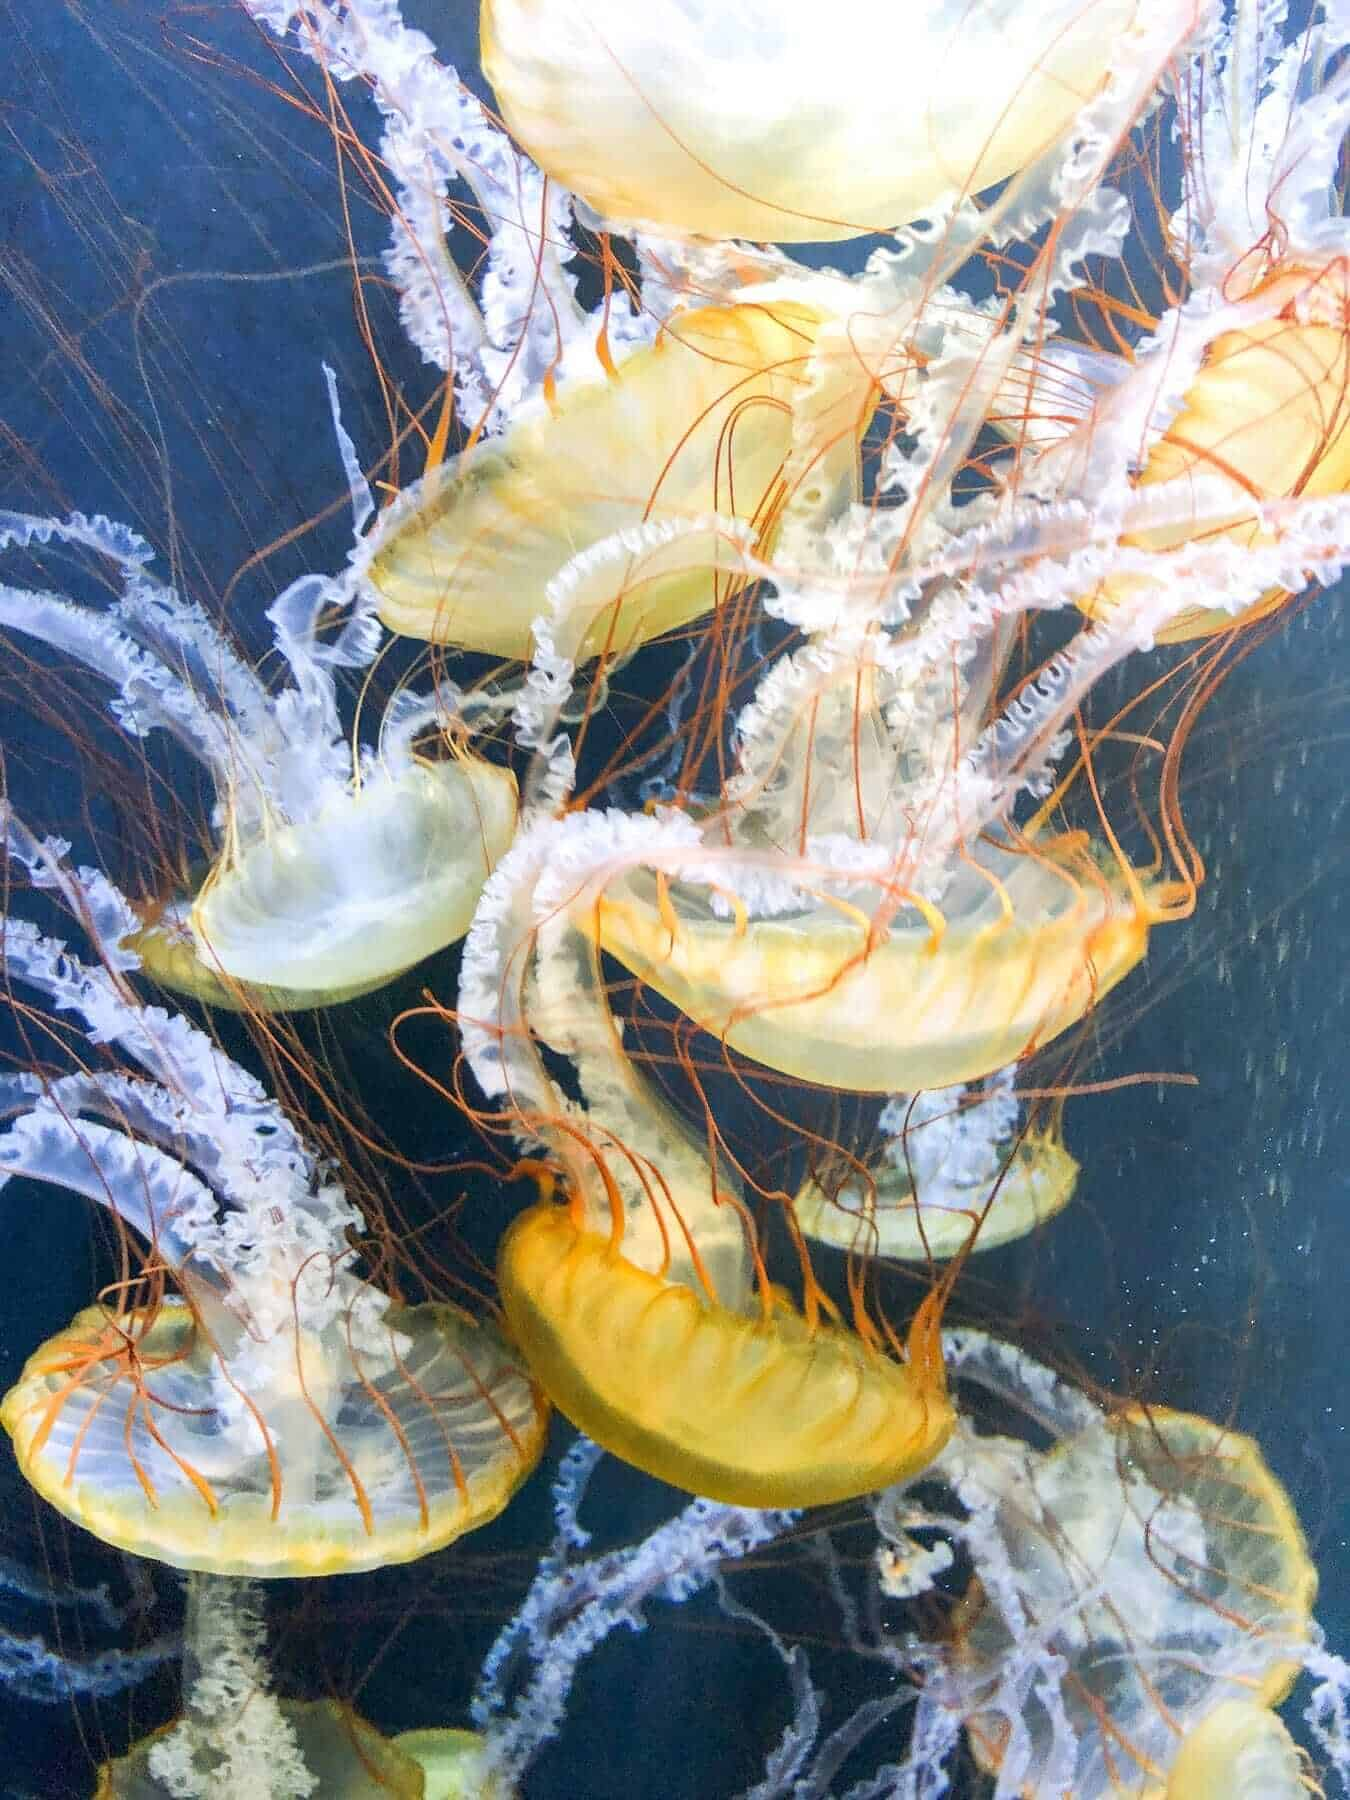 Aquarium of the Bay, San Francisco, USA